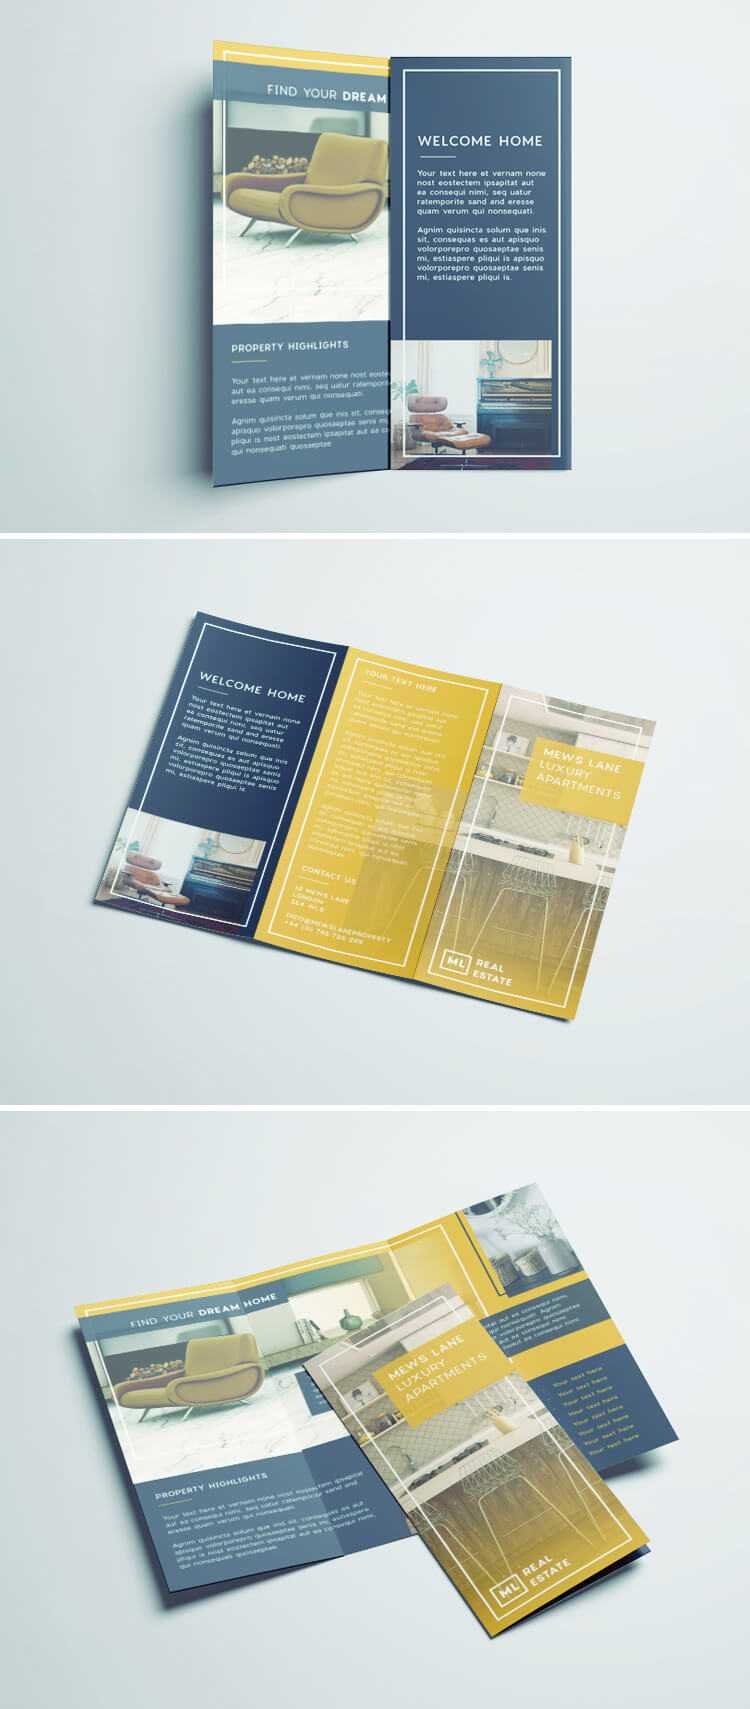 Tri Fold Brochure | Free Indesign Template intended for Tri Fold Brochure Template Indesign Free Download